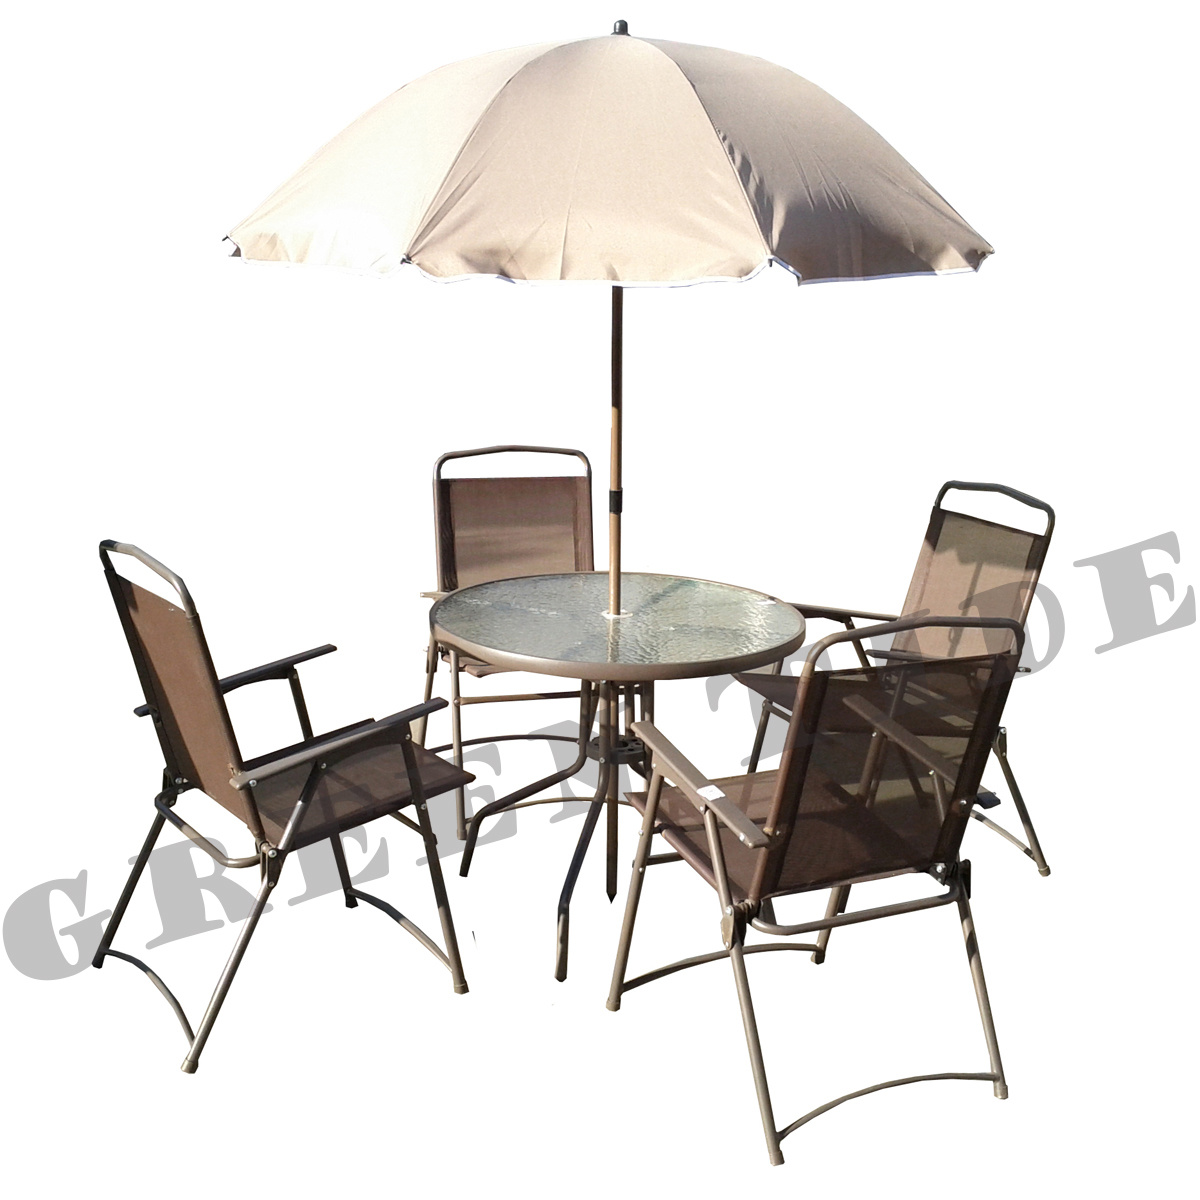 China Patio Outdoor Garden Dining Table